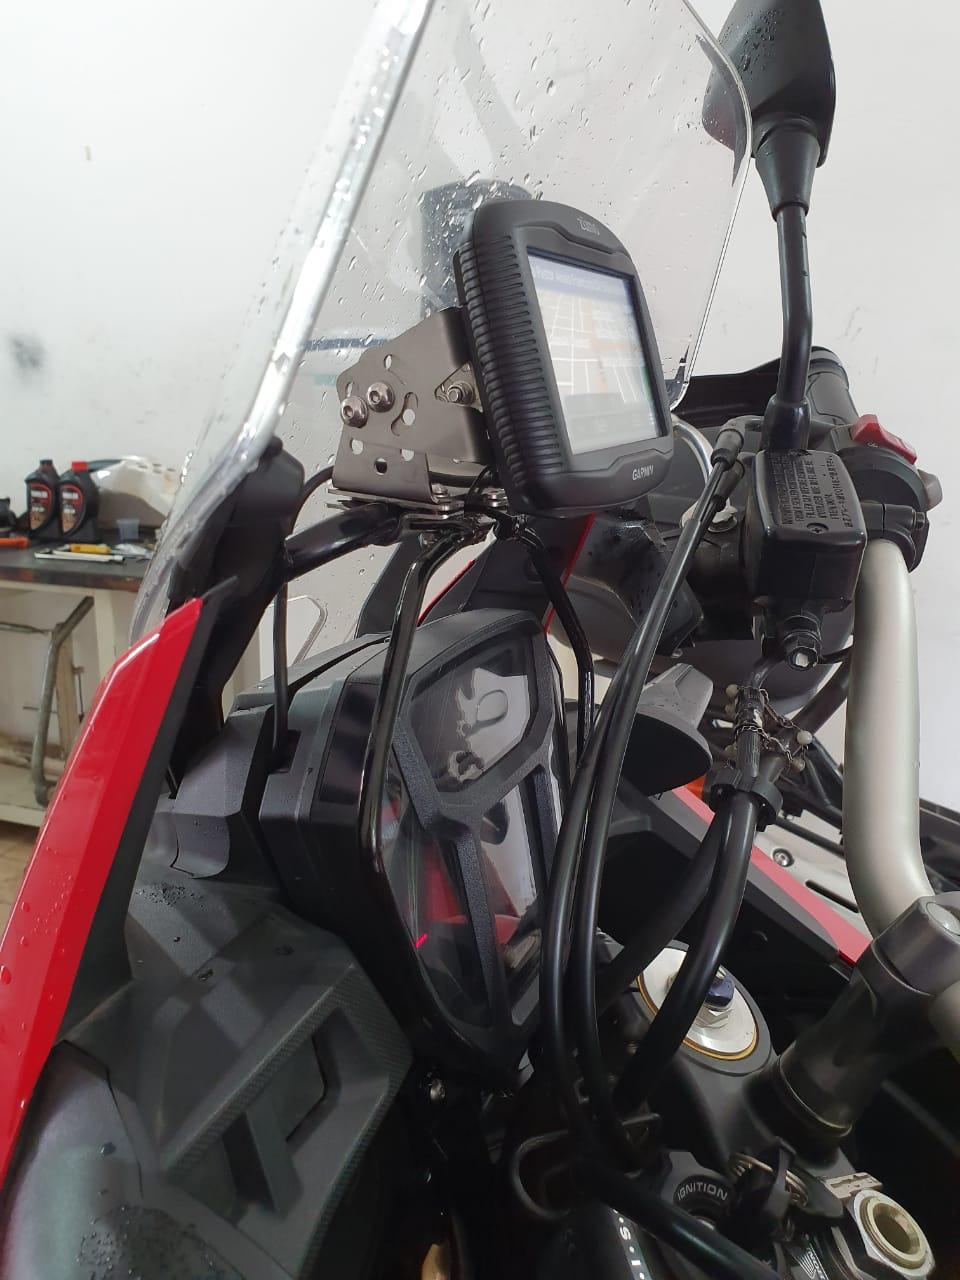 Suporte Moto Gps (garmin Zumo)